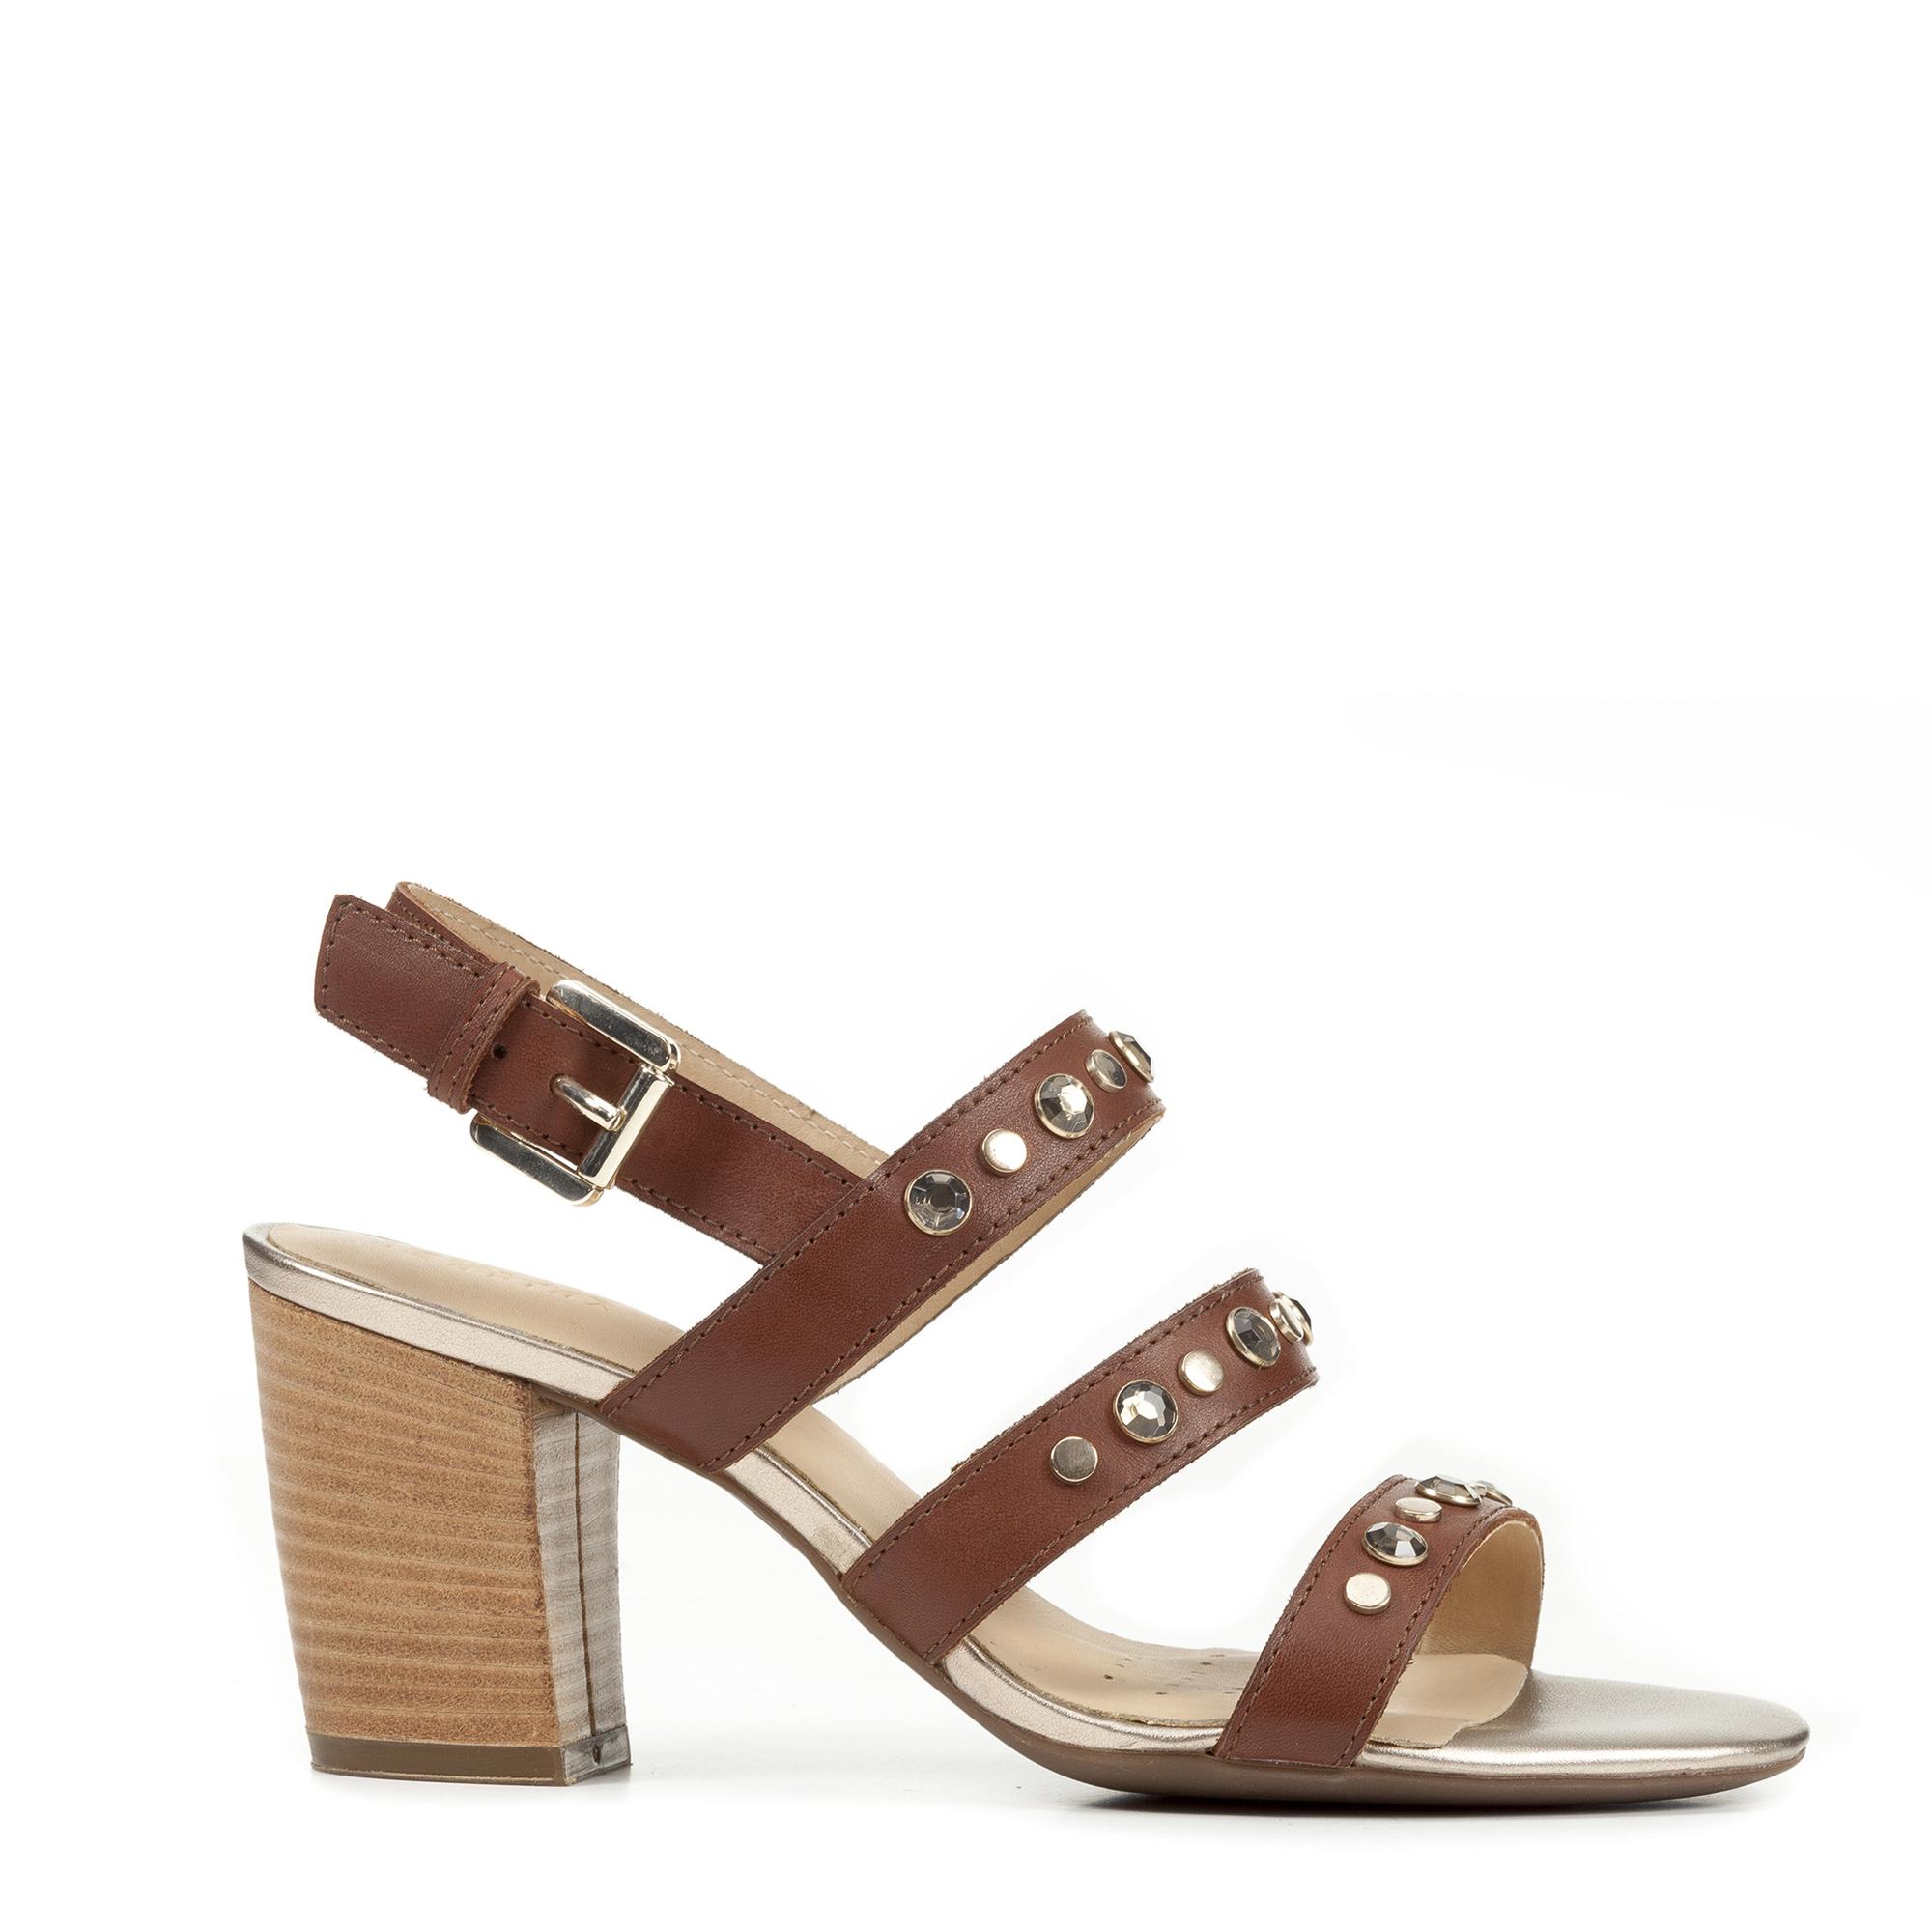 Eudora Woman From Women Geox Tendencies Sandals Footbed 2 Strap Brown 42